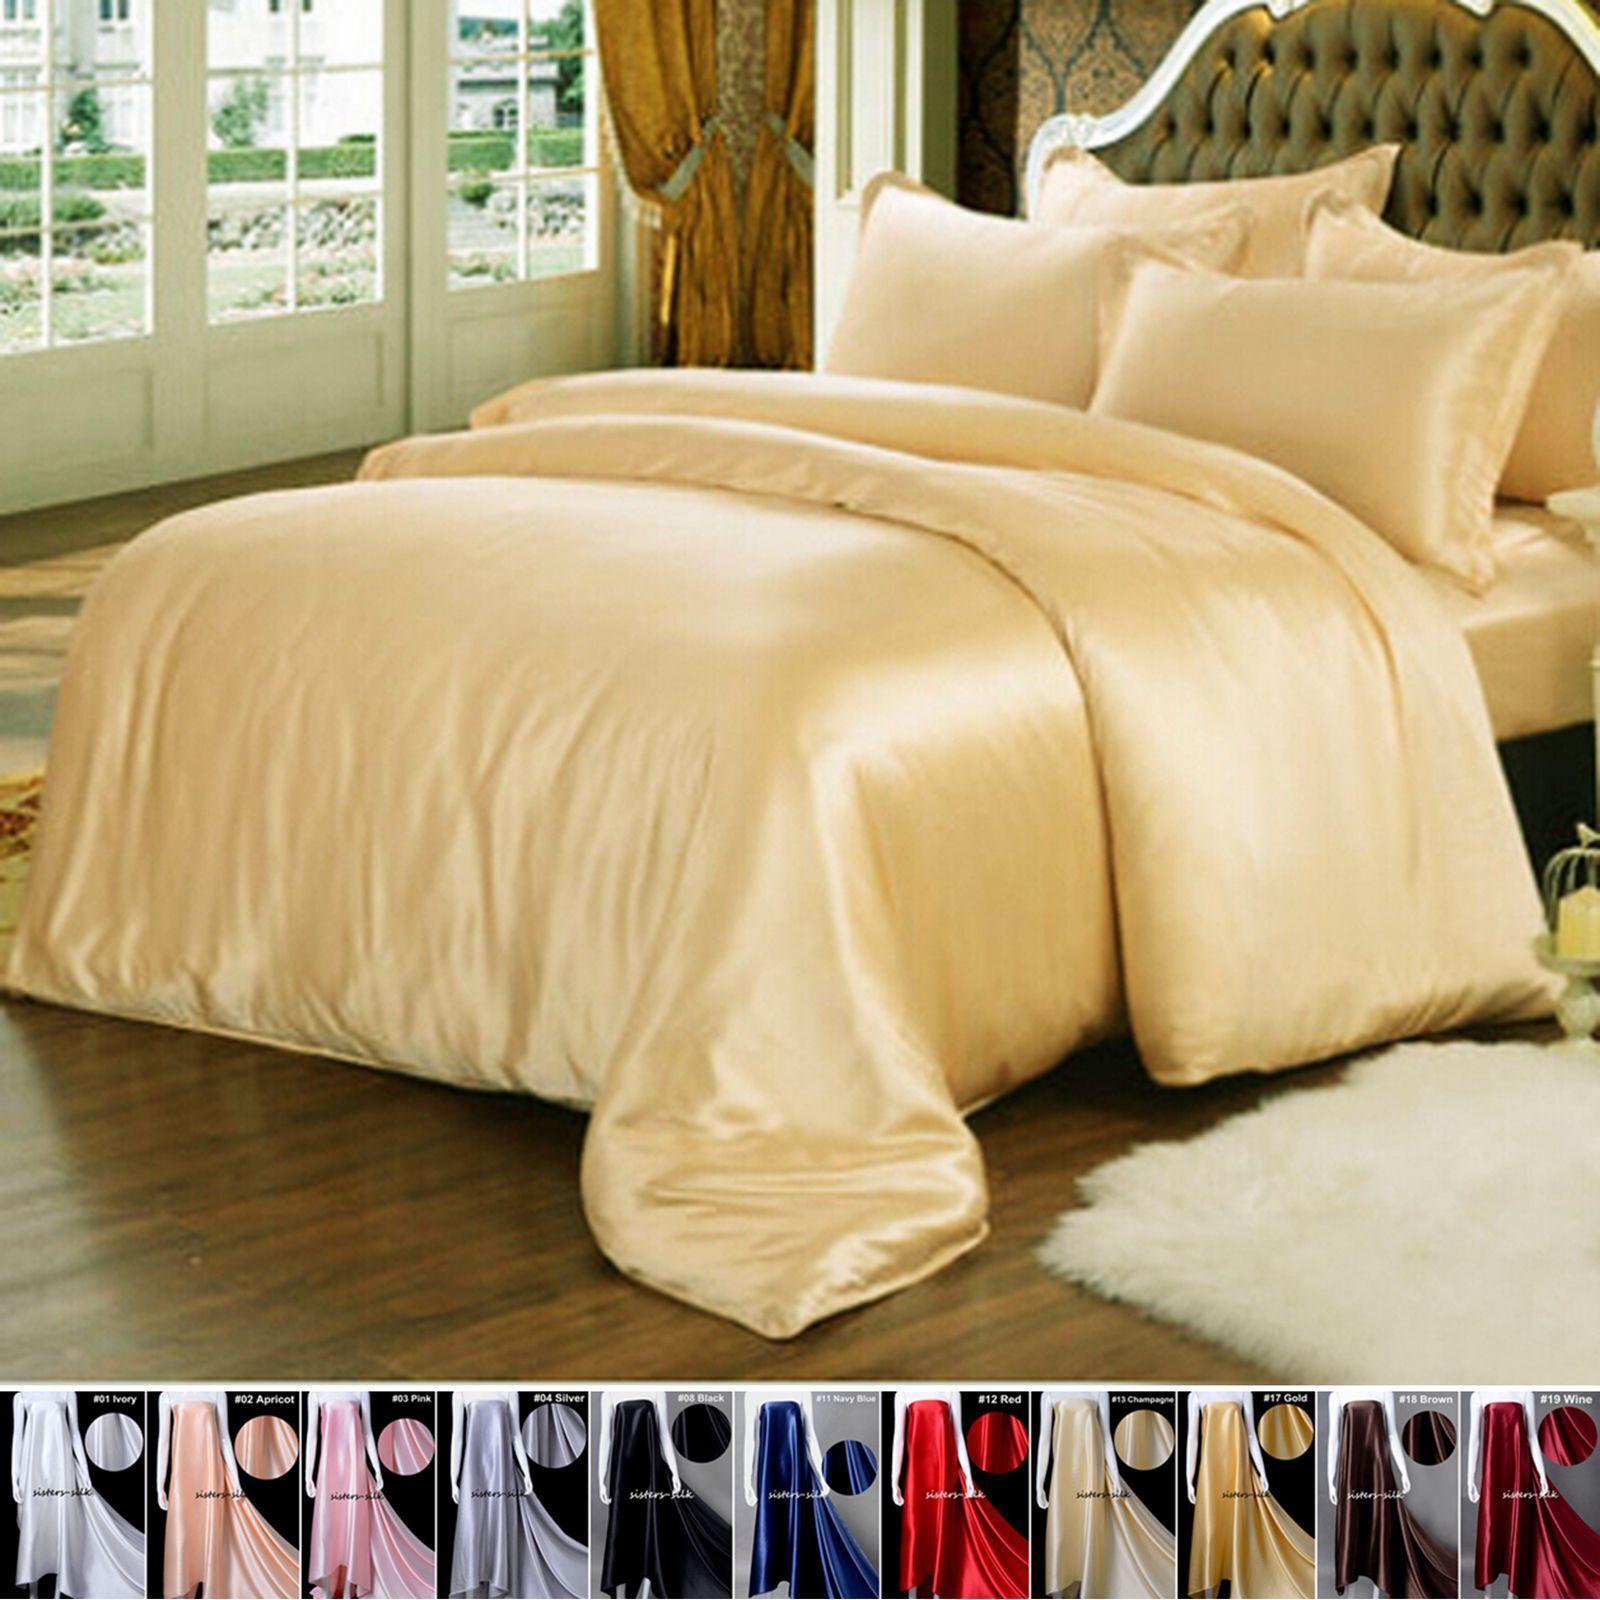 4Pc Black Silks Duvet Cover Bedding Sheet Set Queen King Size Pillow Cases Sets